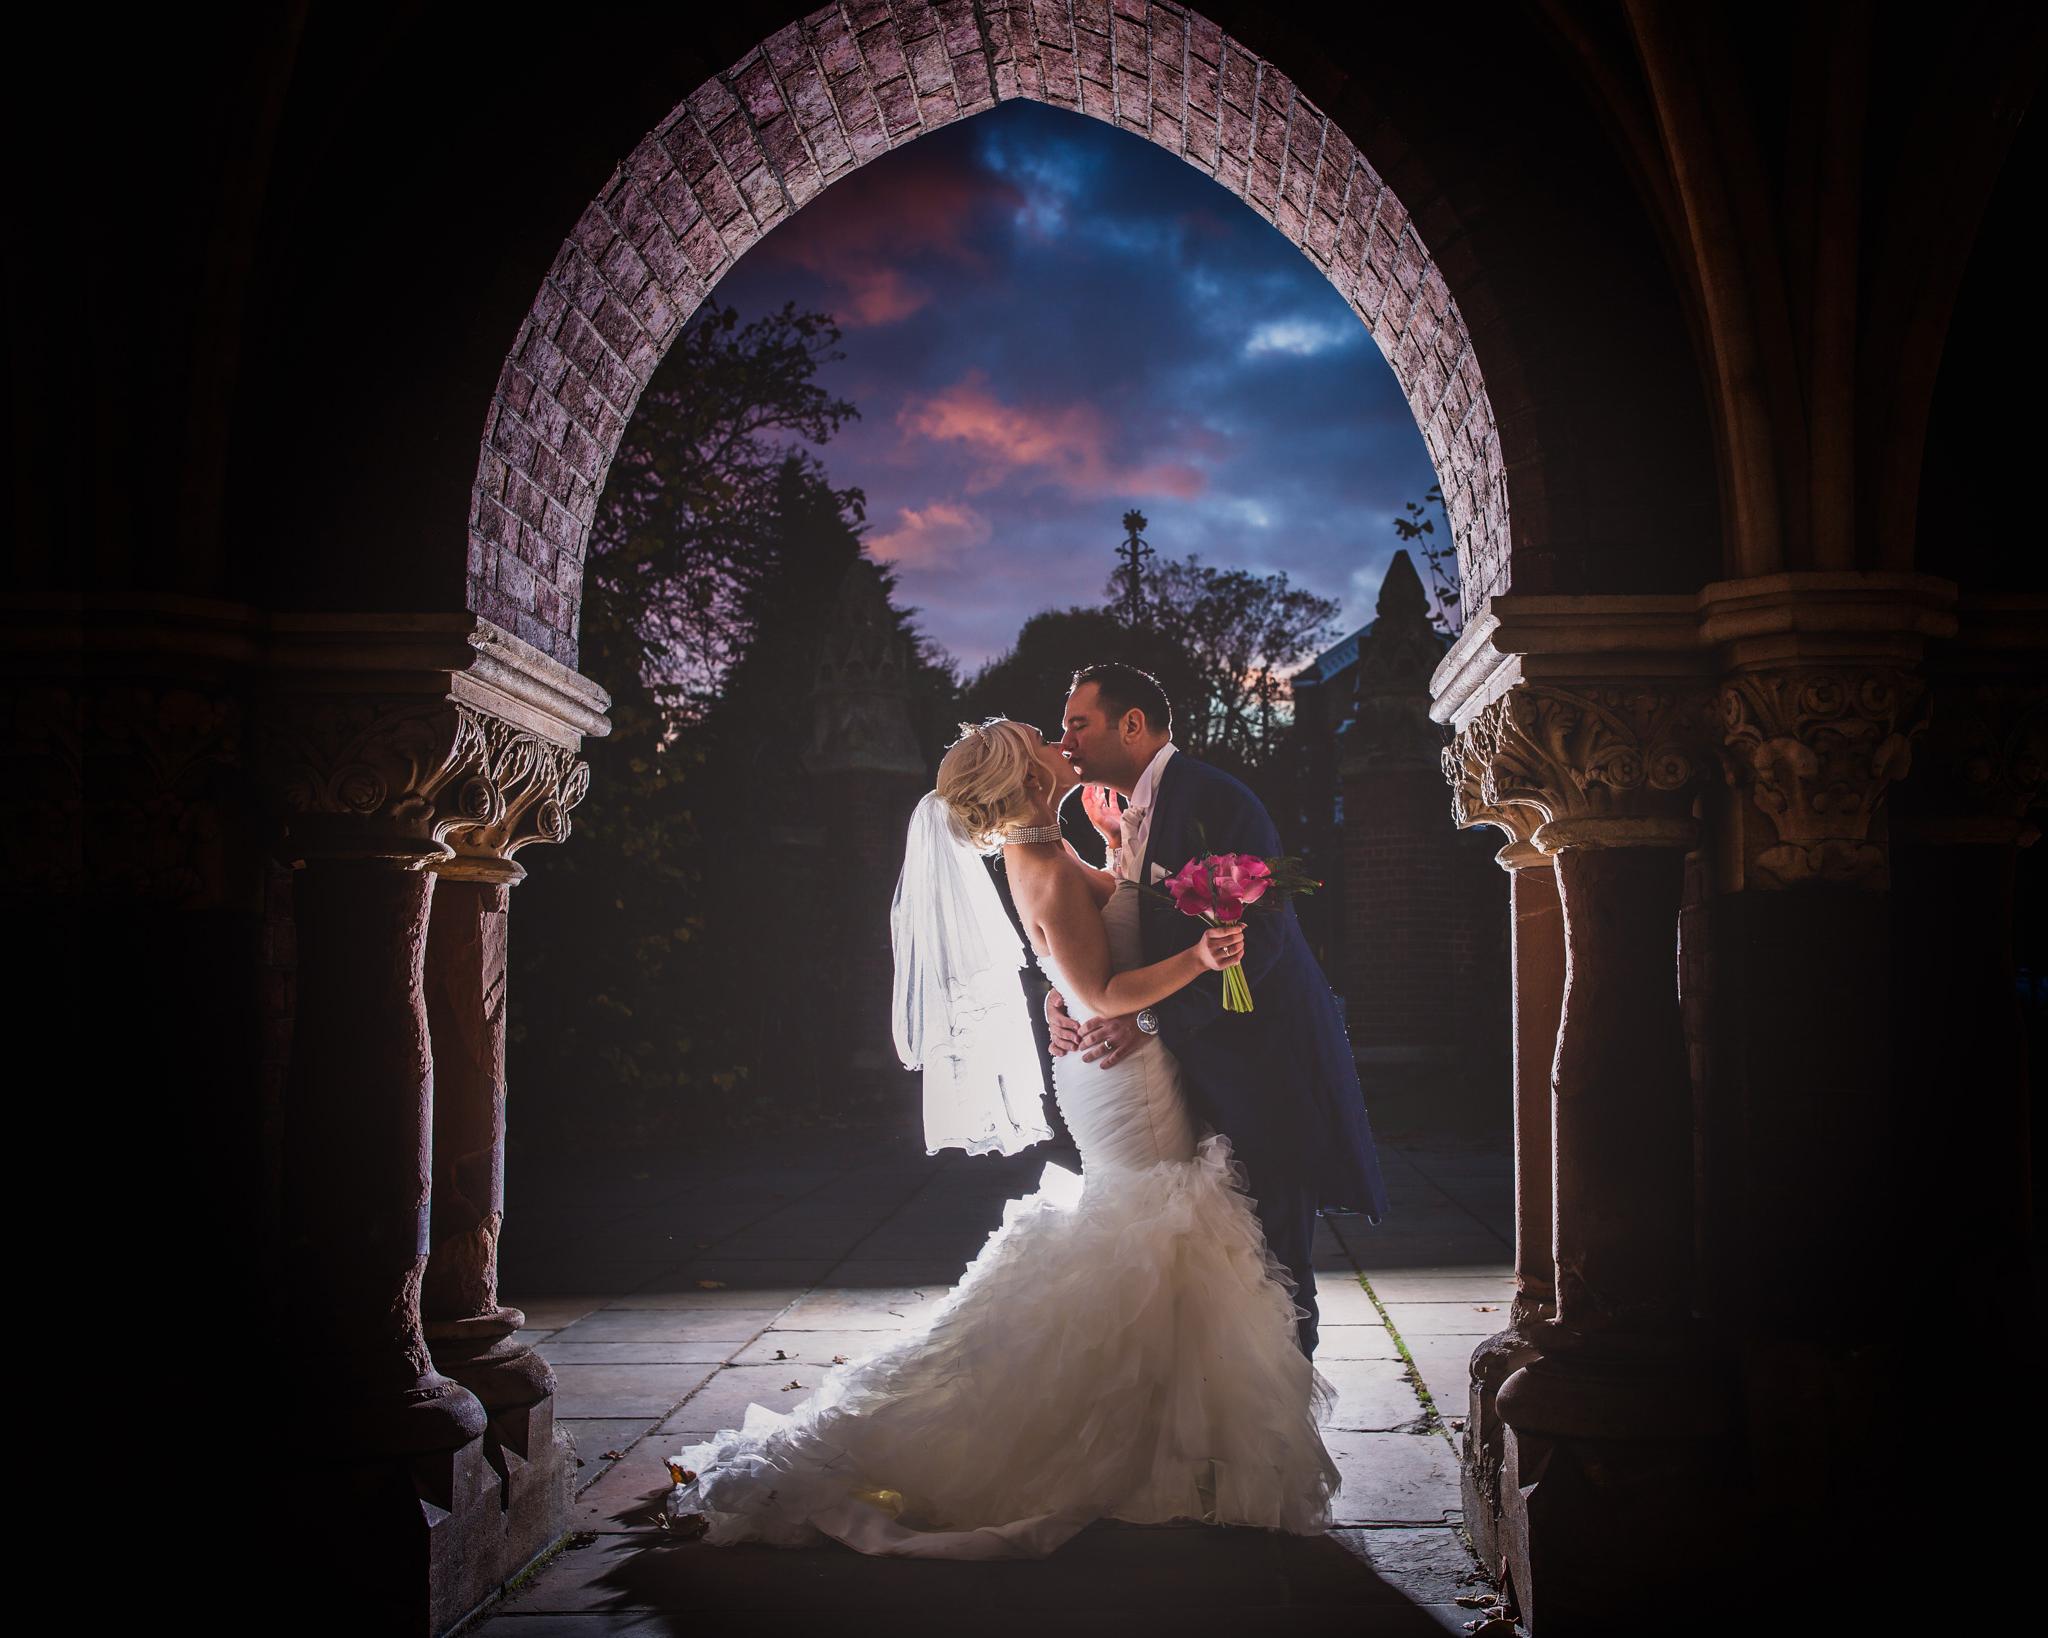 Church of All Saints: Emily & Chris Turkish Wedding Photoshoot